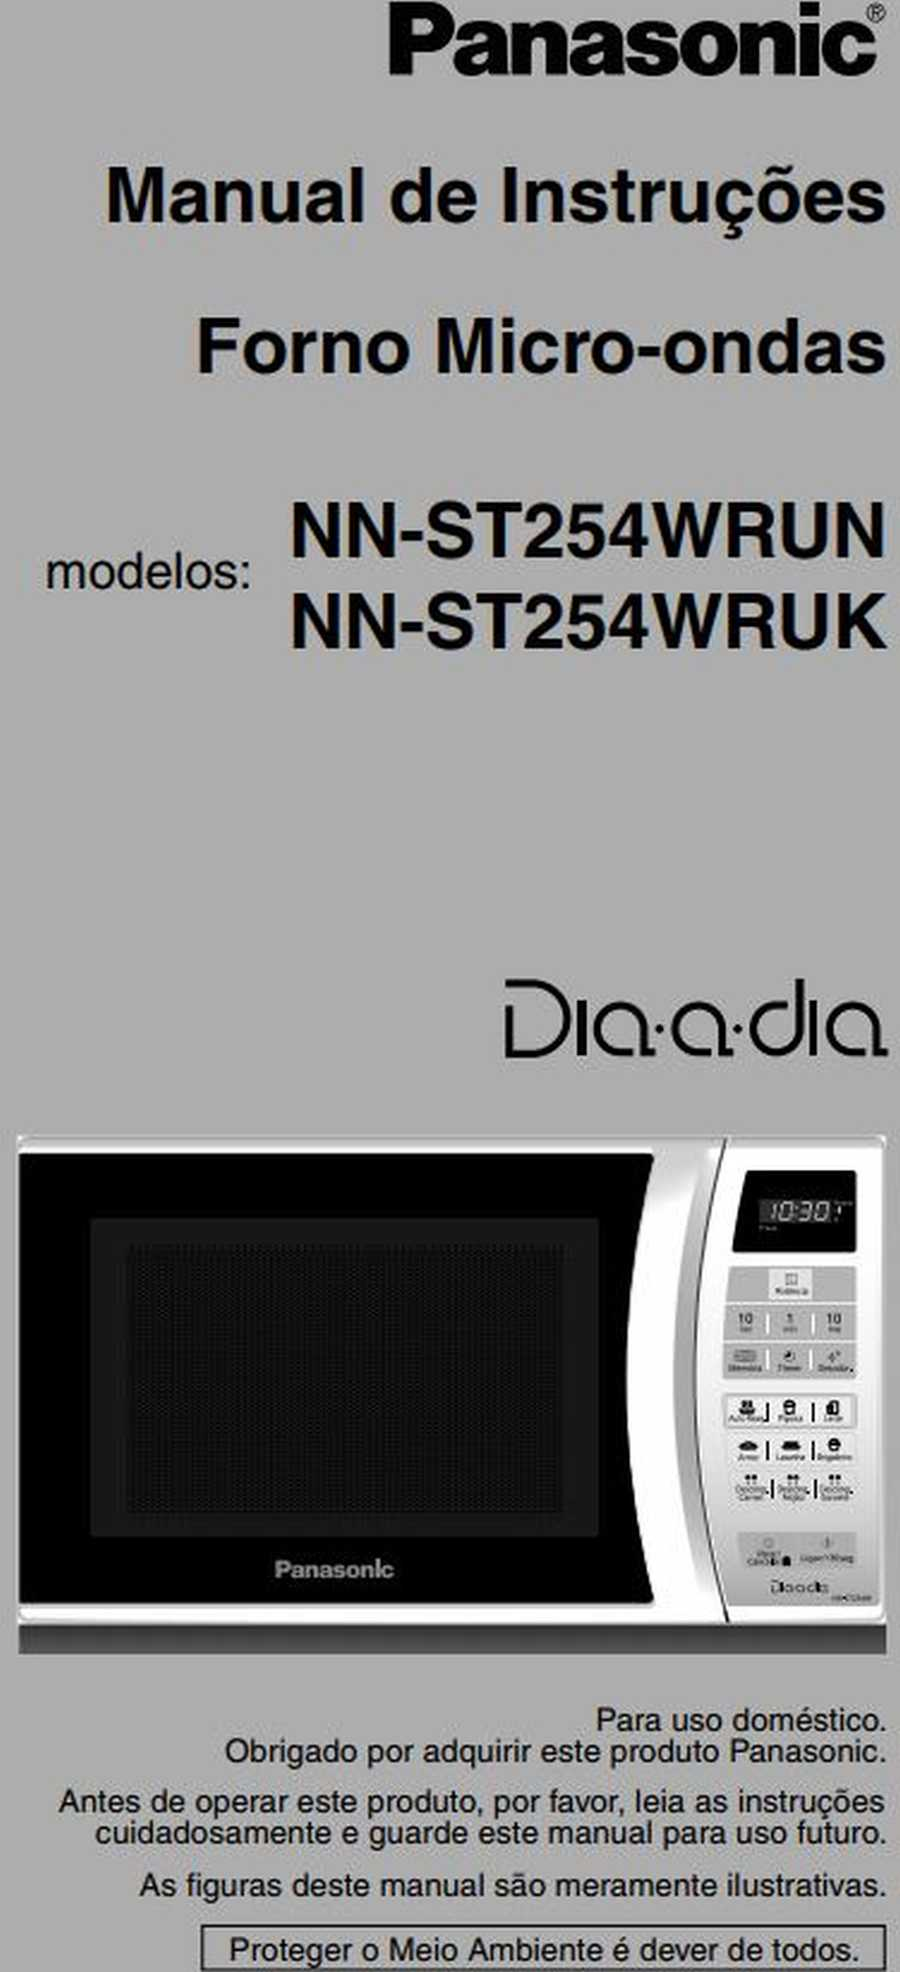 Manual de instruções do microondas Panasonic NN-ST254 - Capa